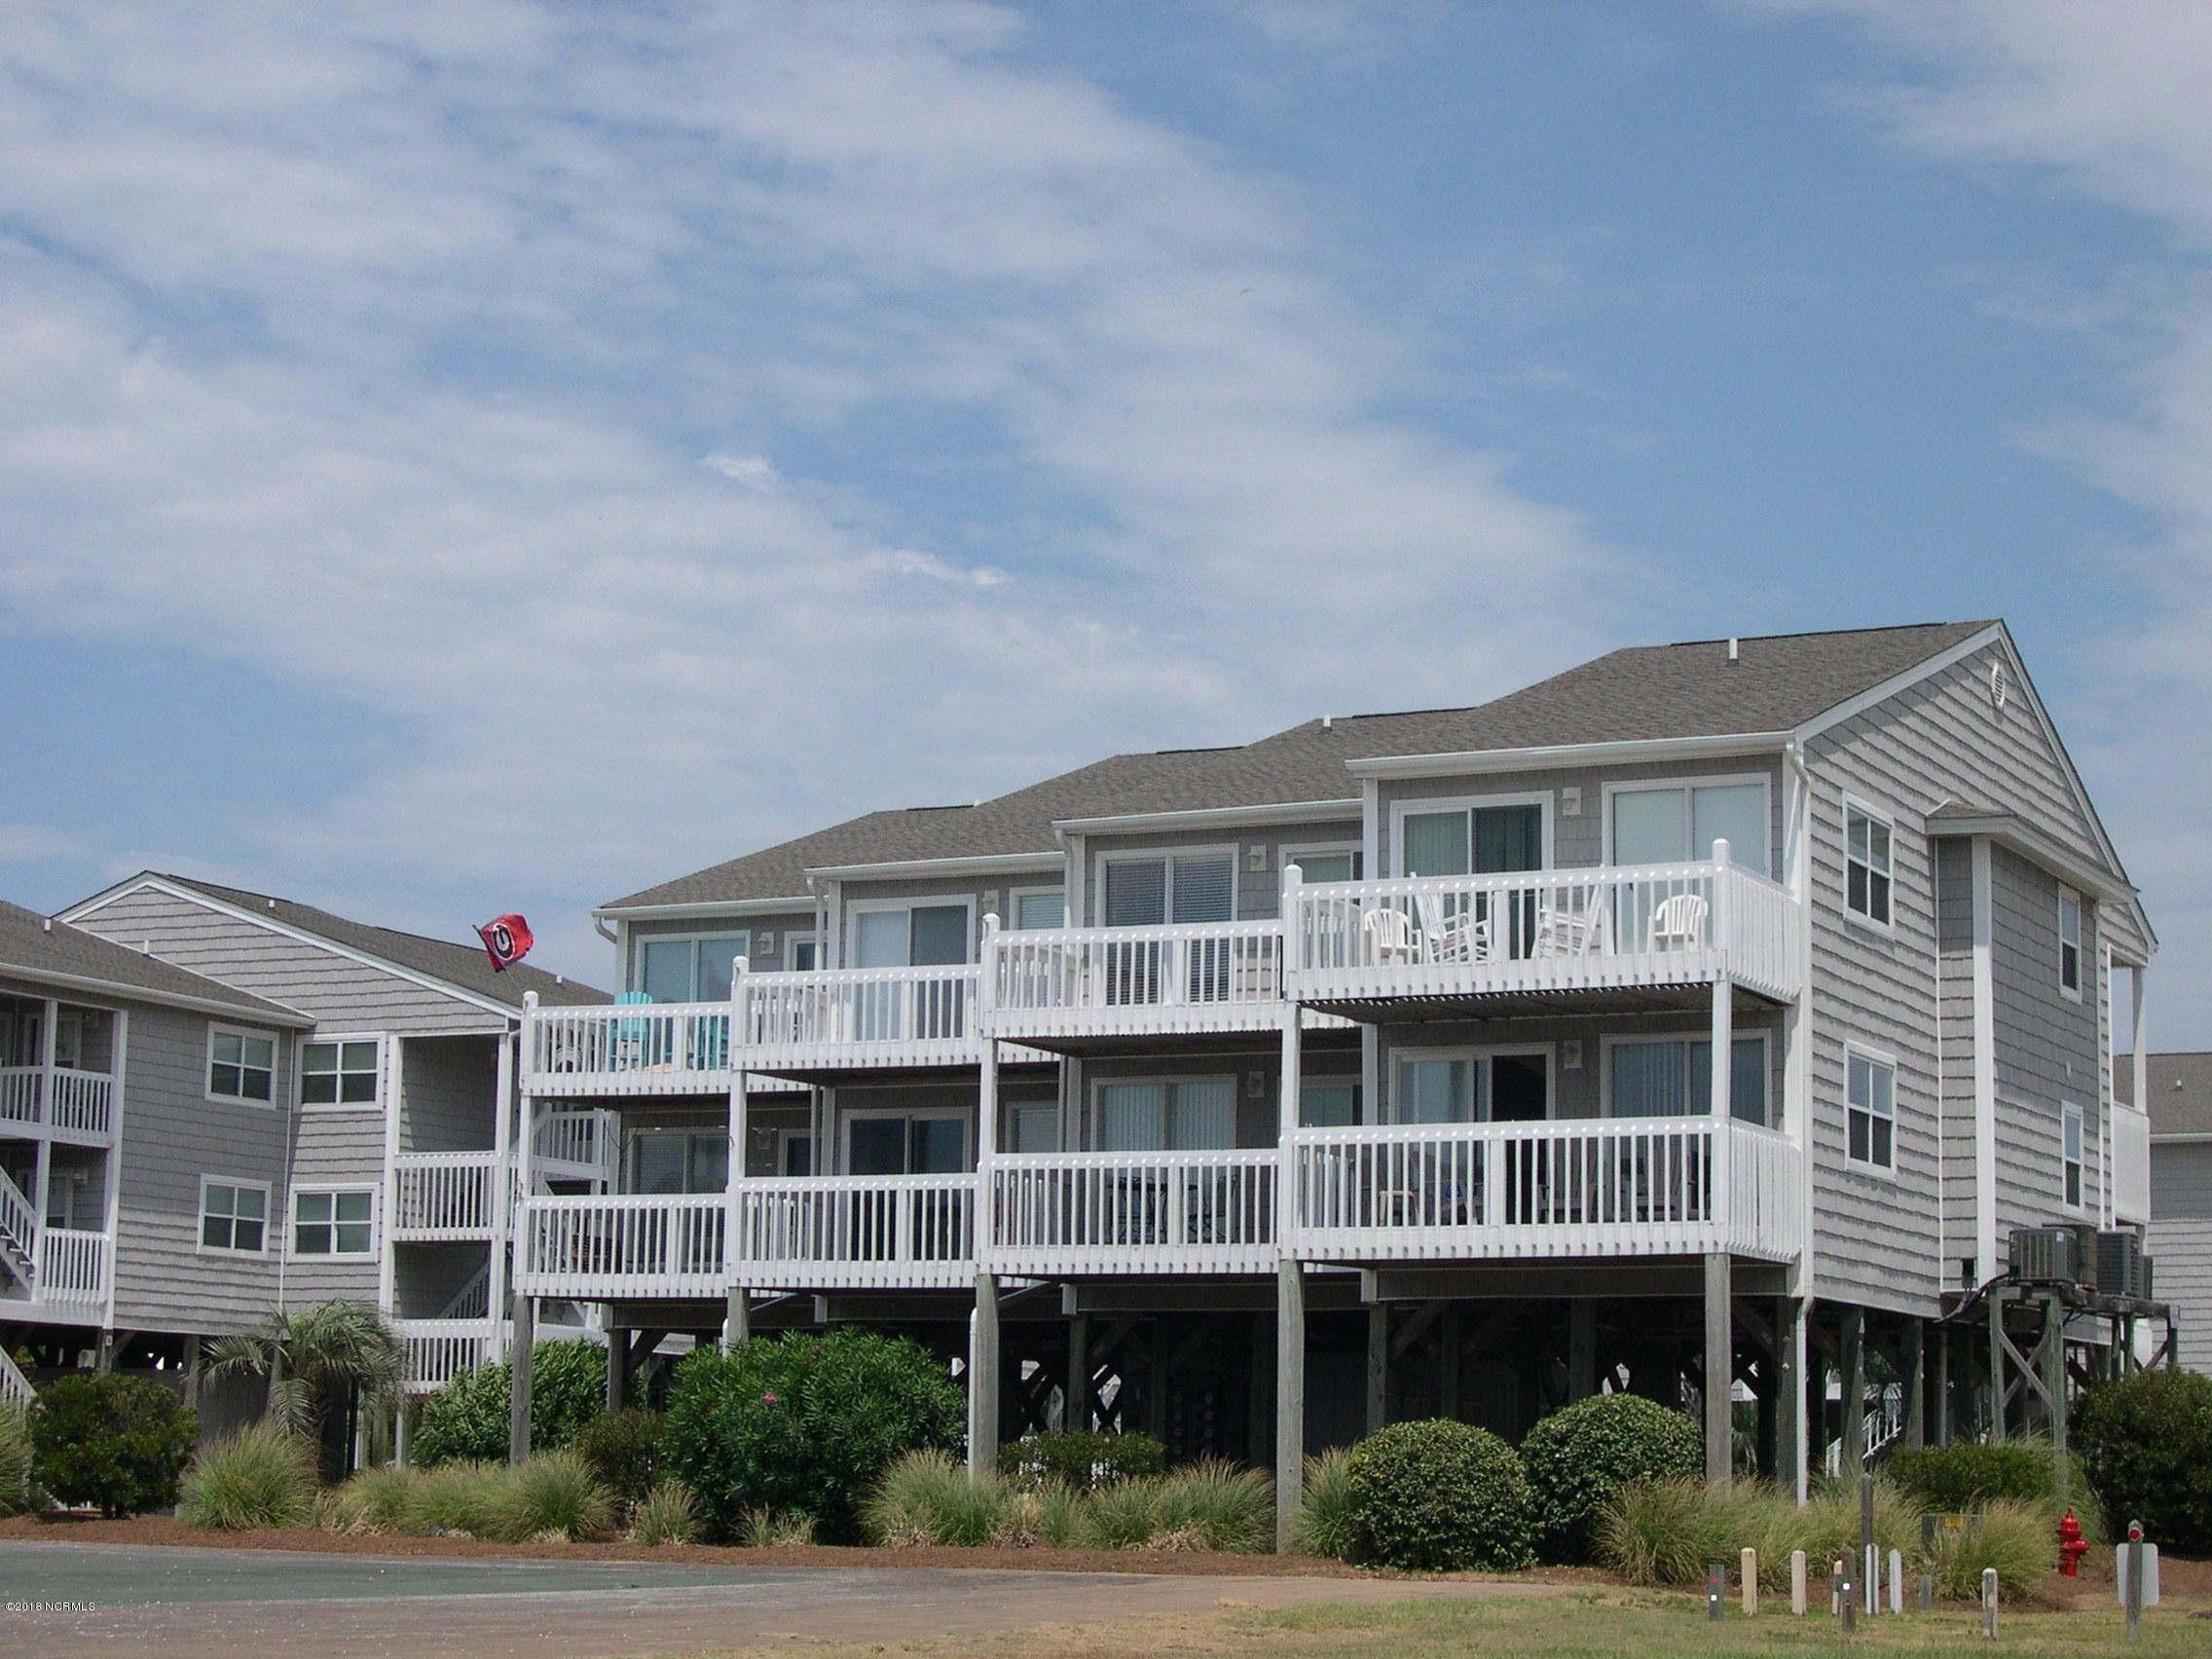 Carolina Plantations Real Estate - MLS Number: 100144051